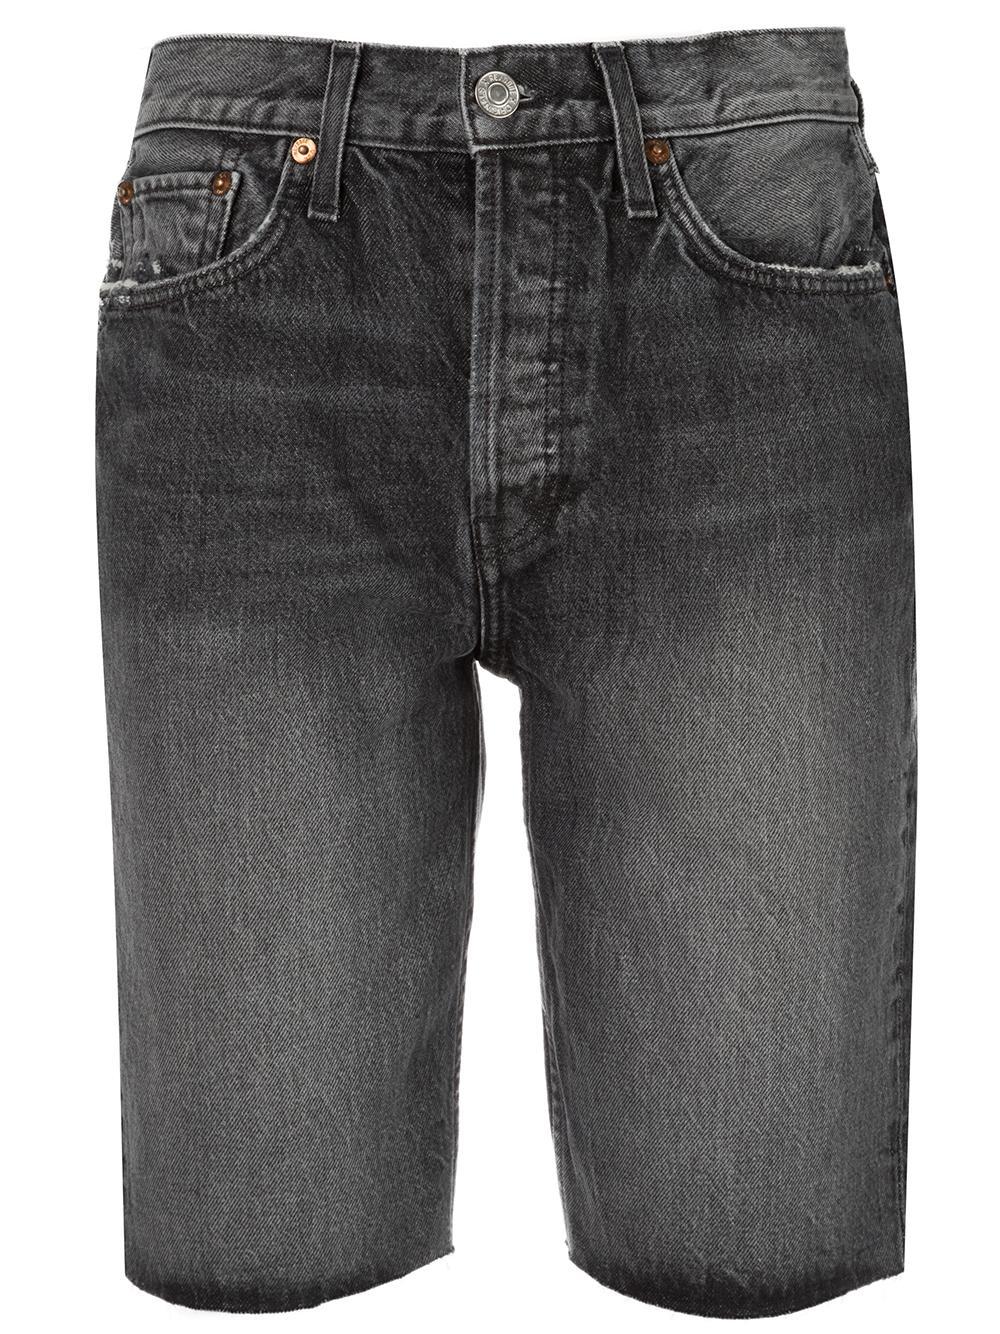 80s Long Short